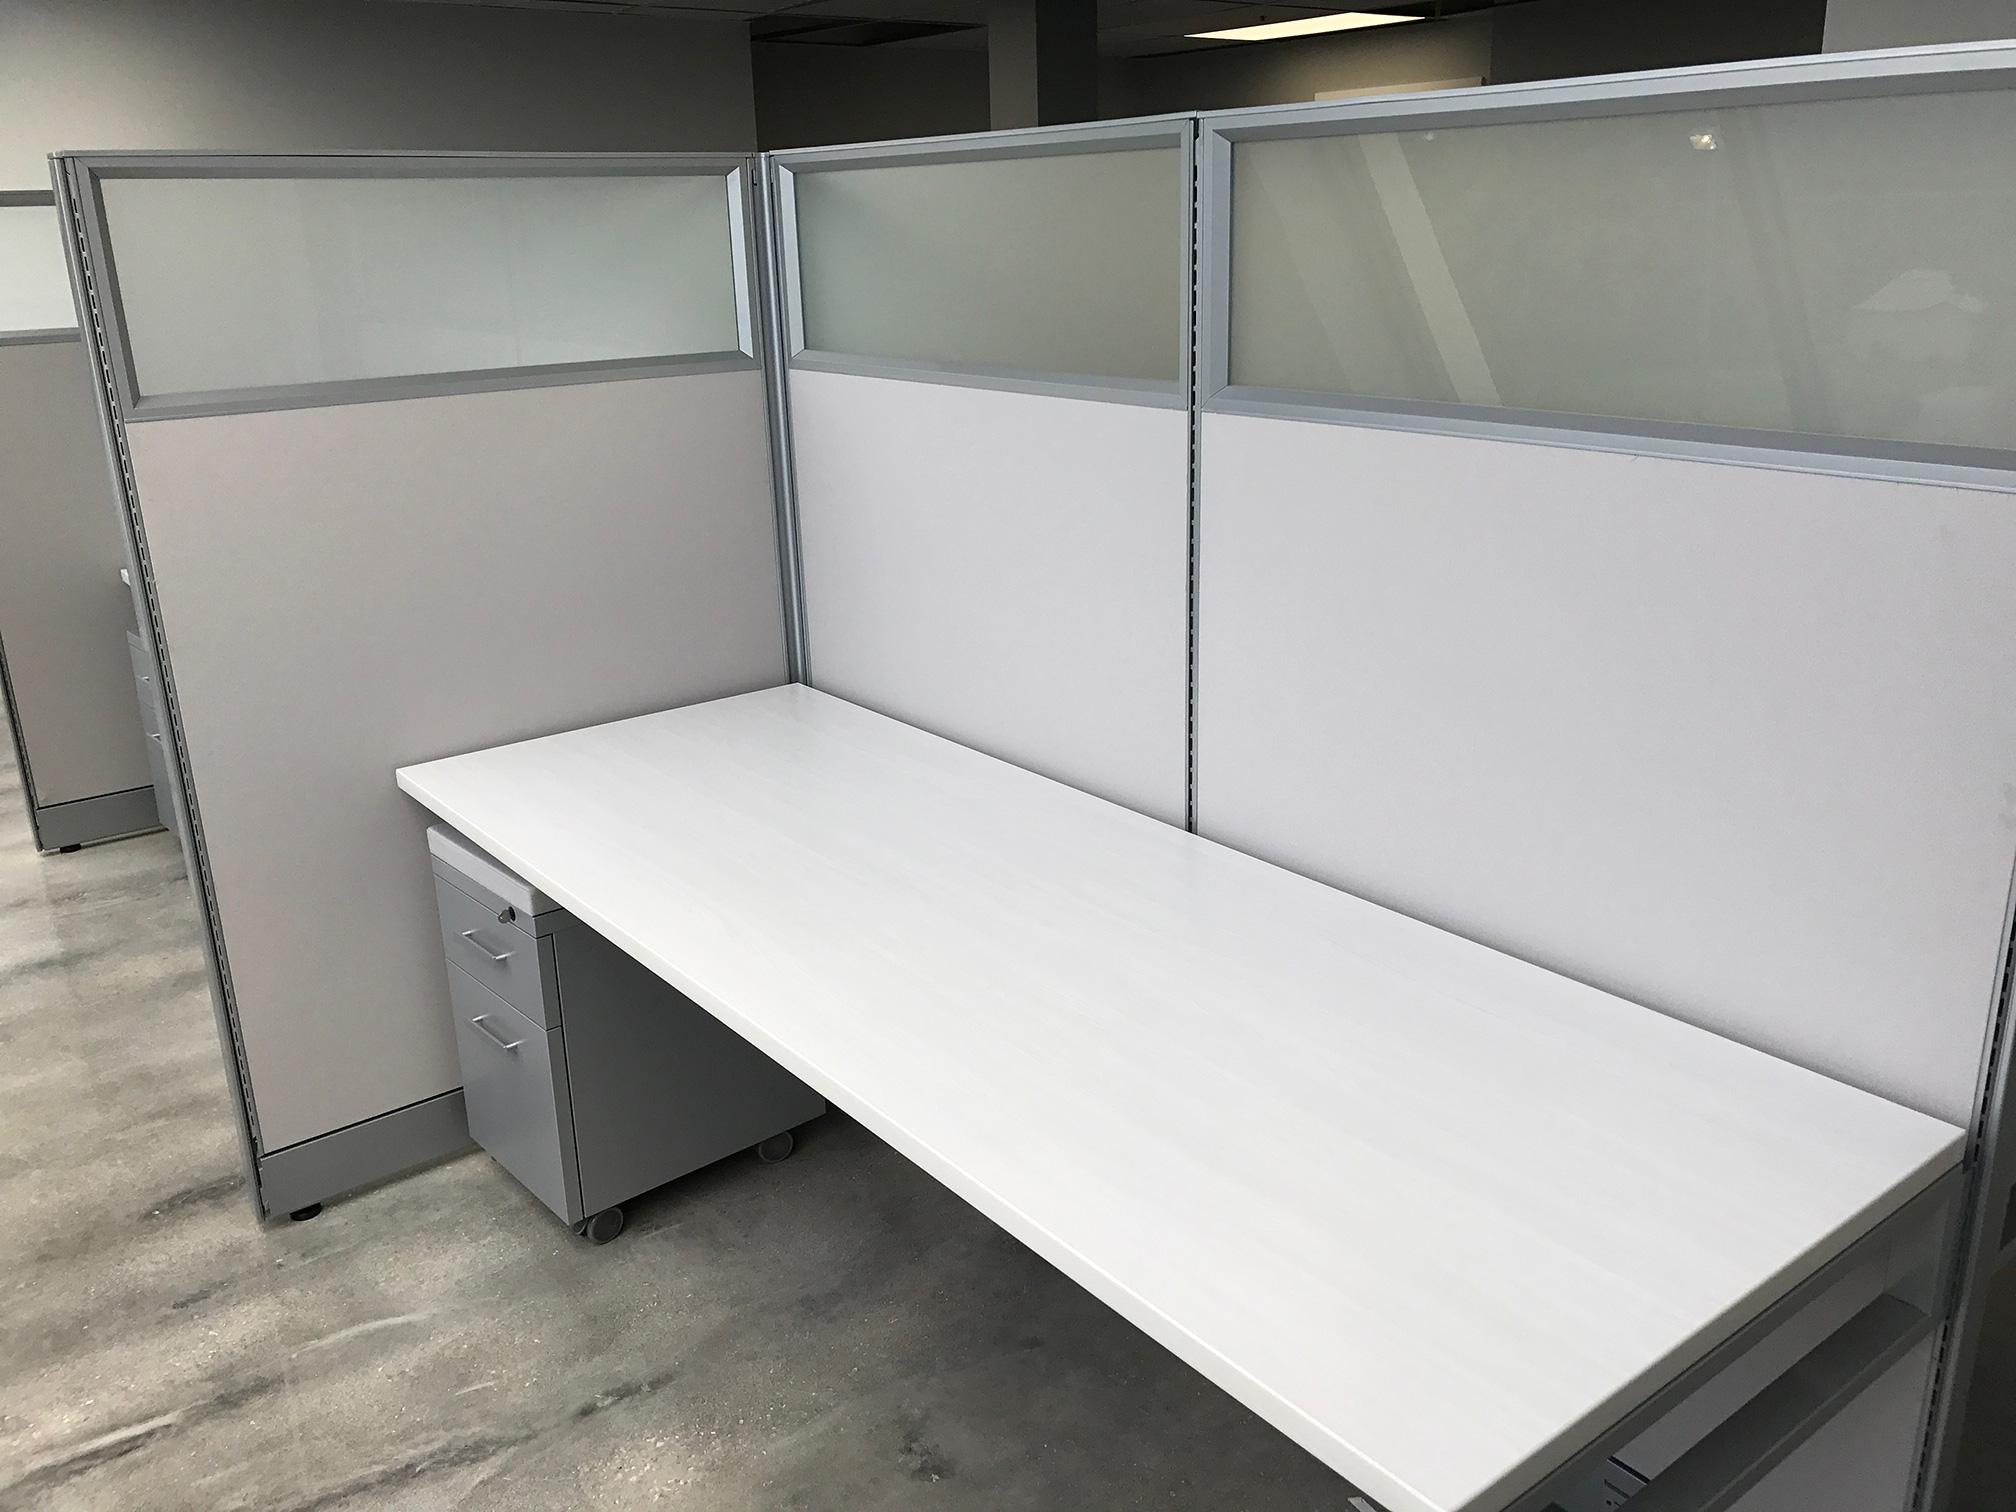 work-cubicles-bradenton-florida-manasota-office-supplies-llc.jpg